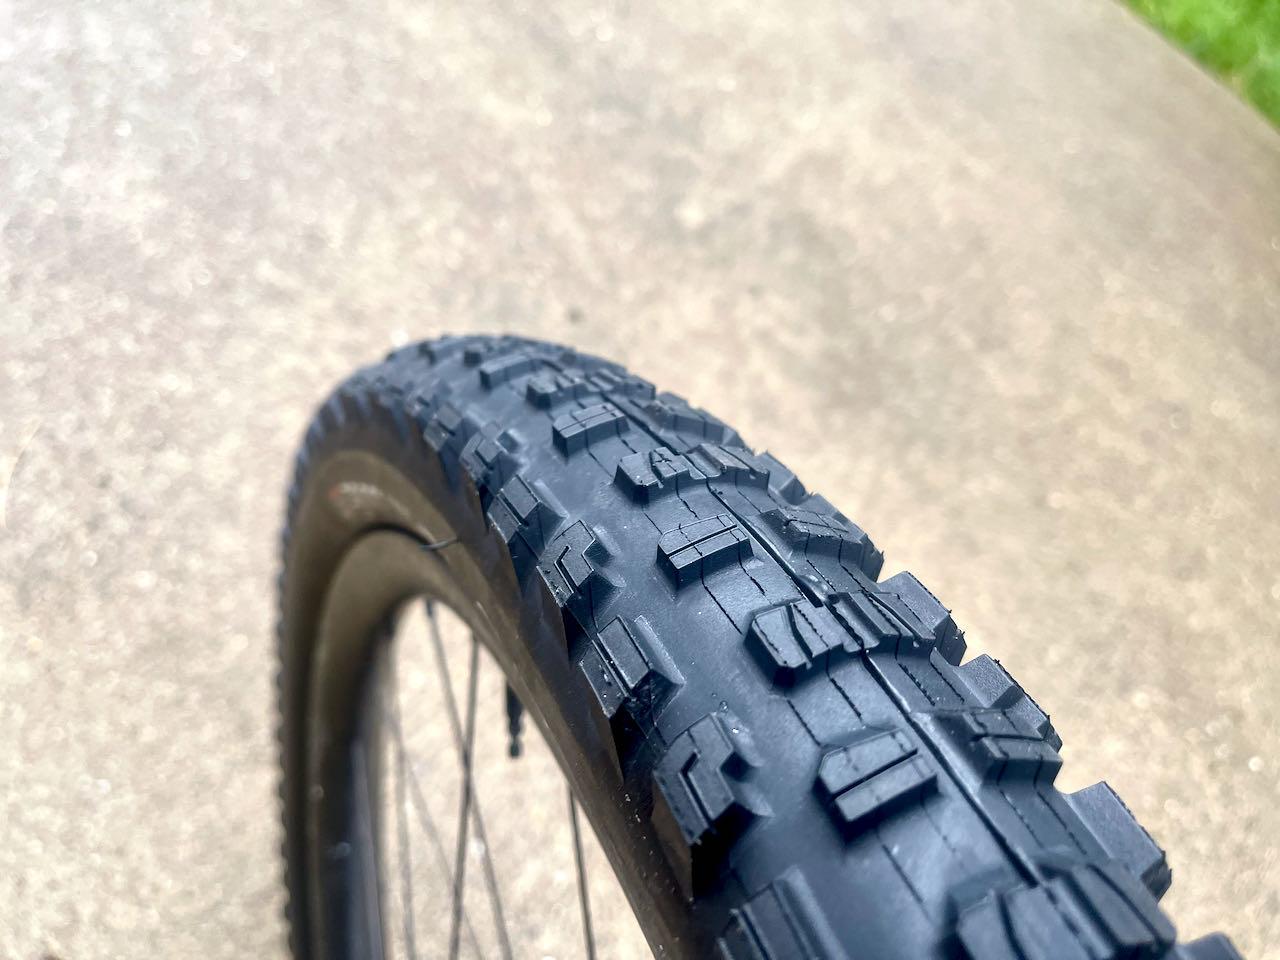 Bontrager XR5 Tread close up